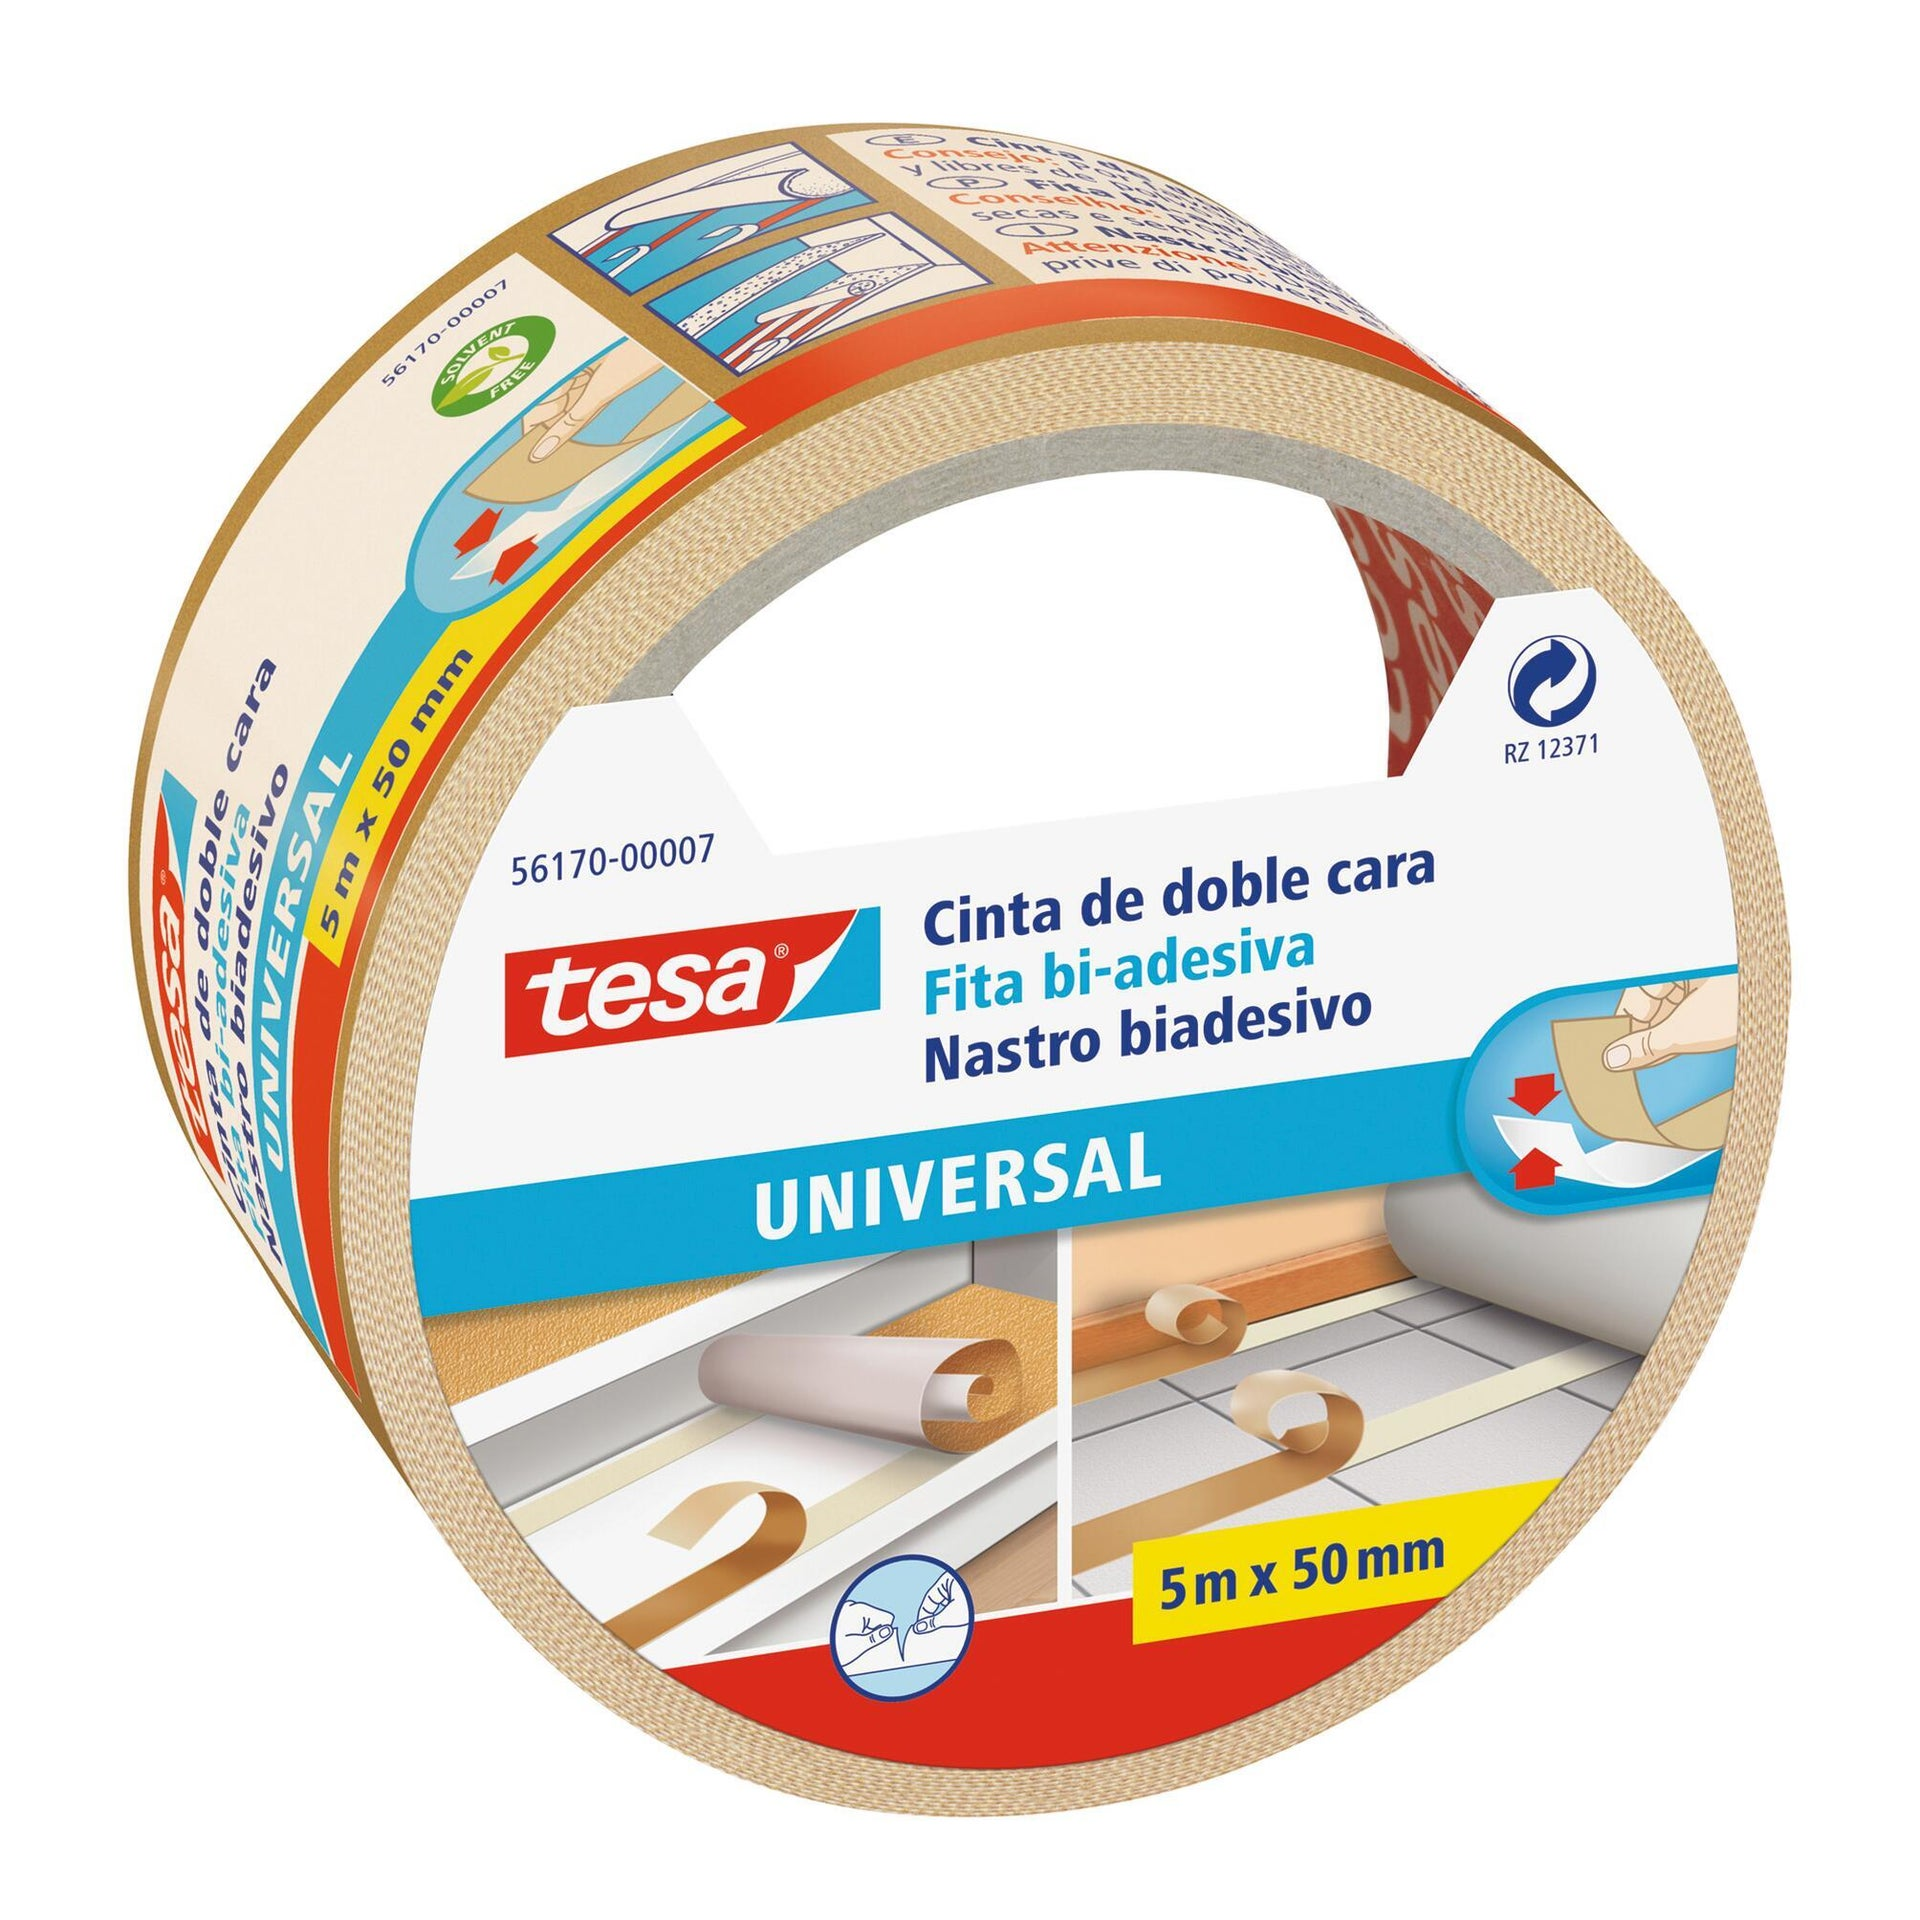 Nastro bi-adesivo TESA TAPE Biadesivo universale filmico 5 m x 50 mm bianco - 8